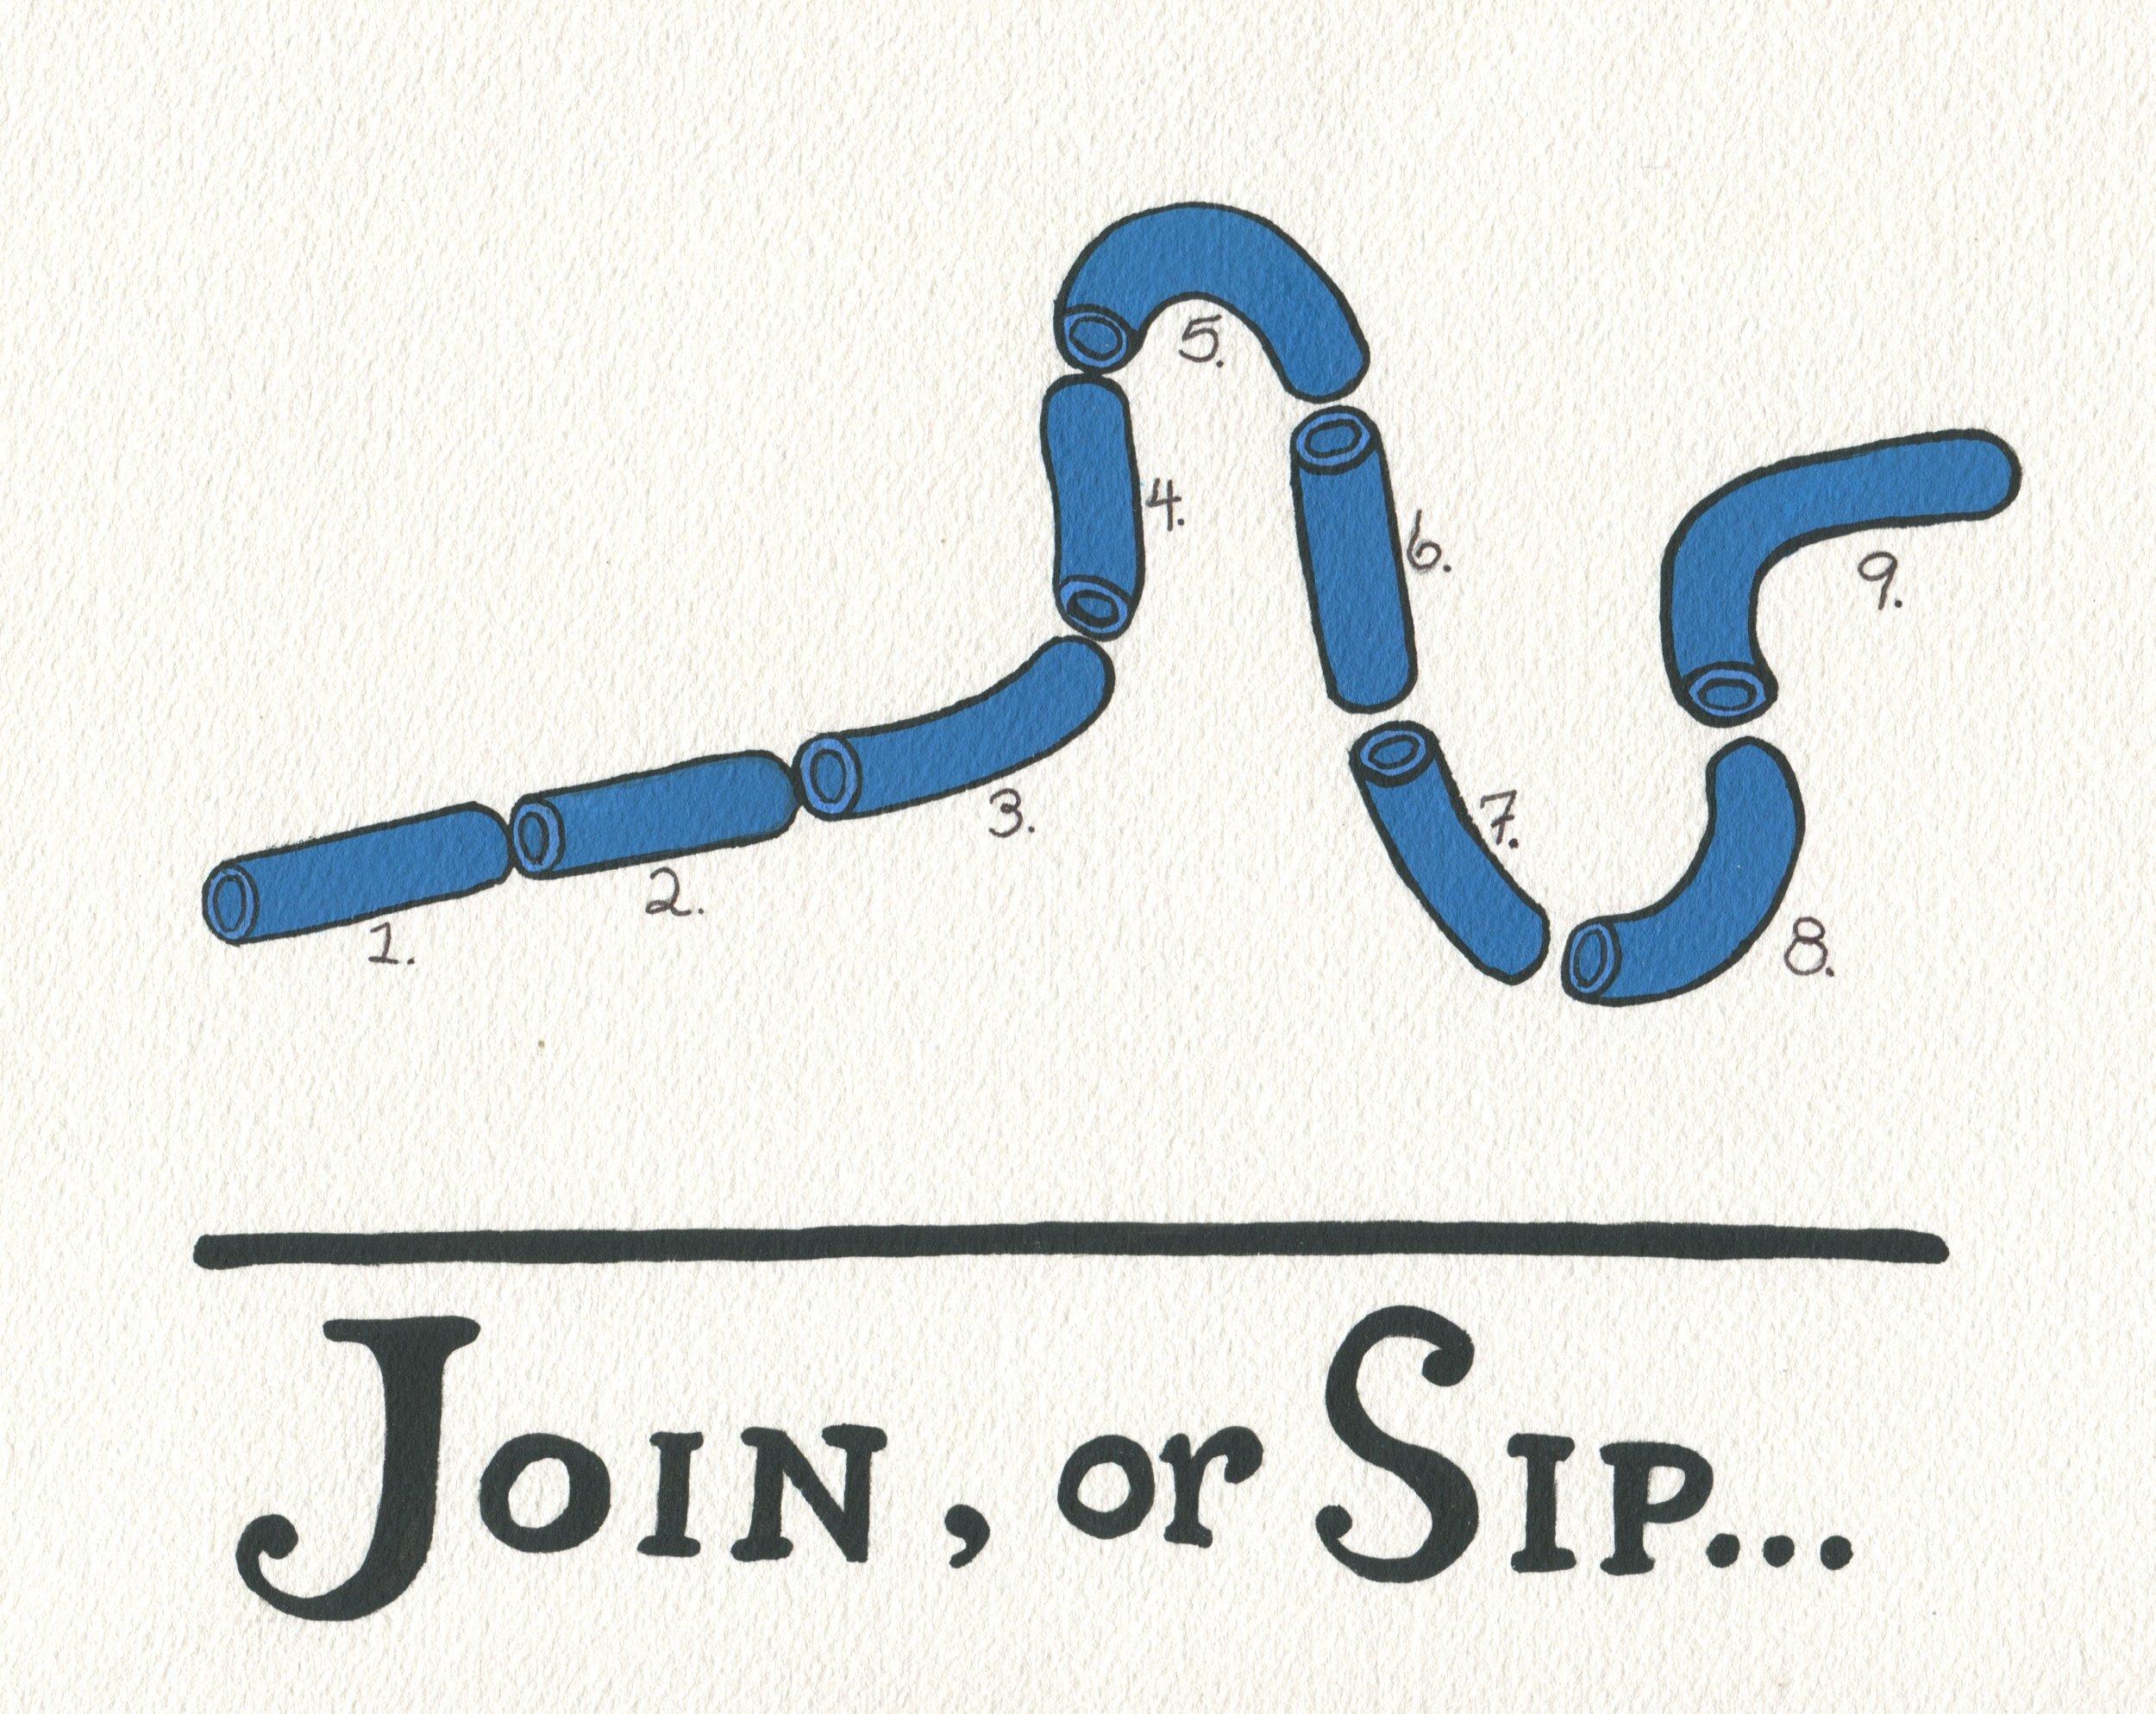 join ro sip.jpeg